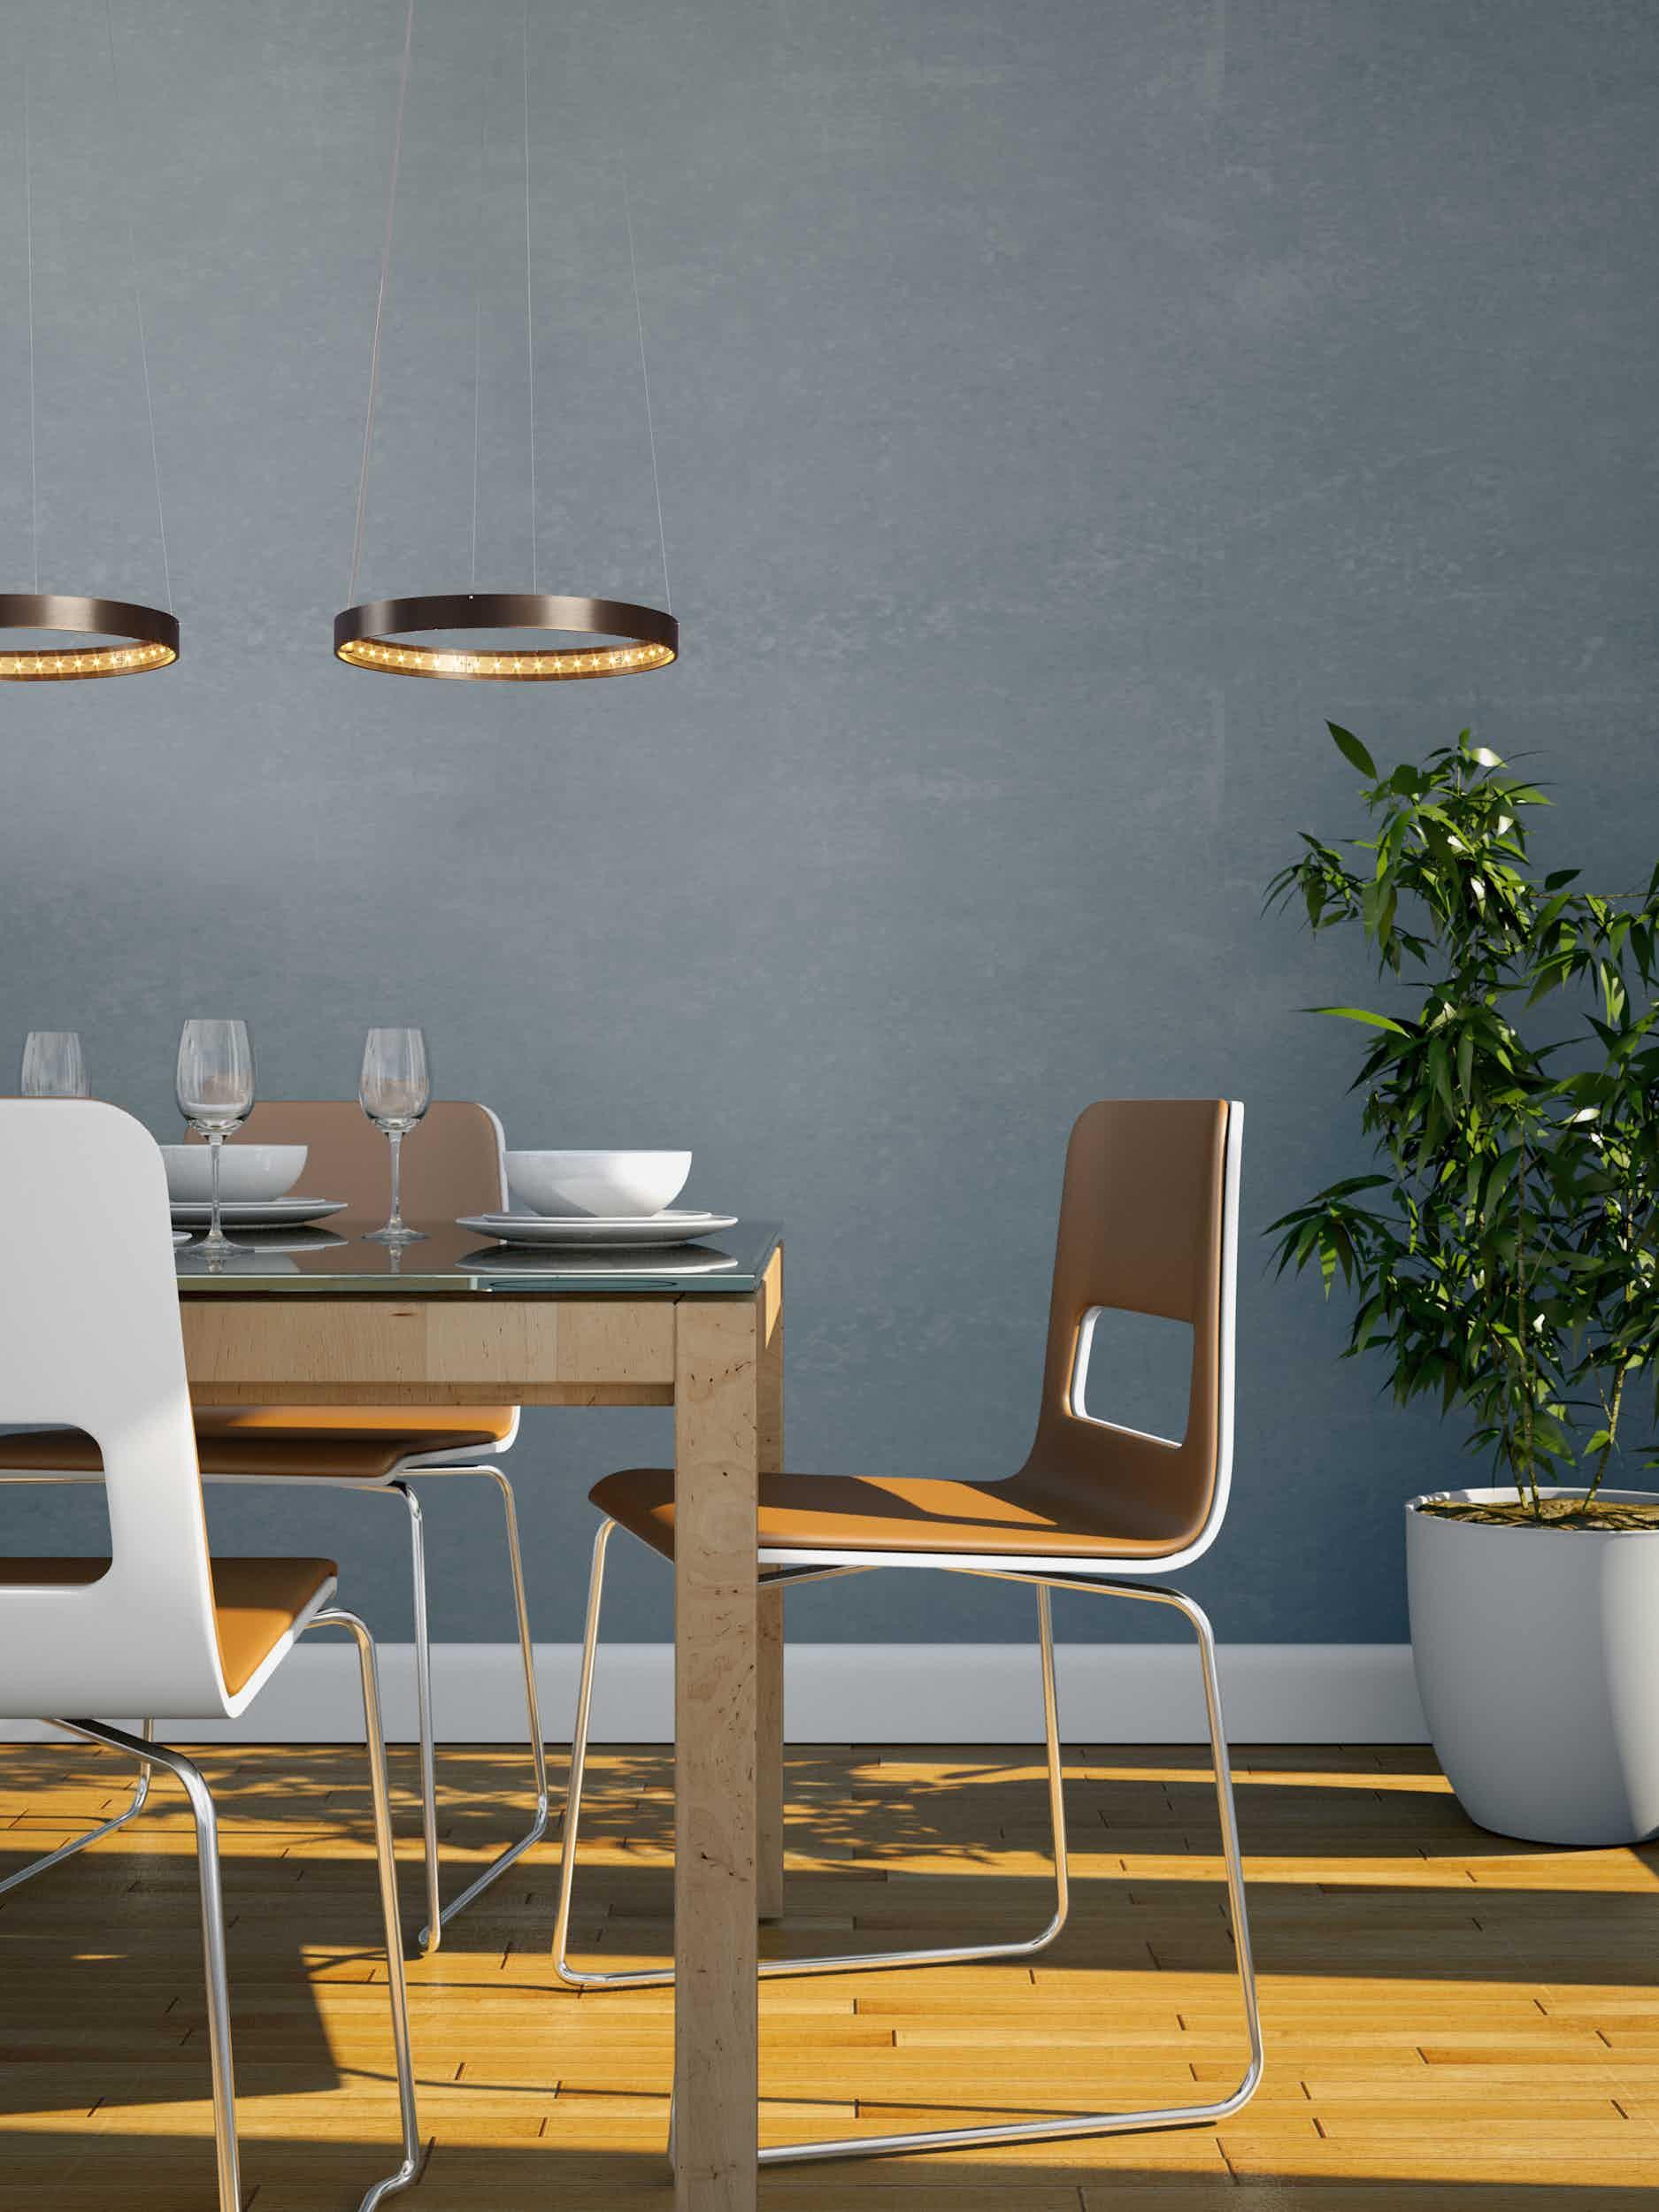 Le-deun-luminaires-circle-30-hanging-lamp-bronze-table-haute-living